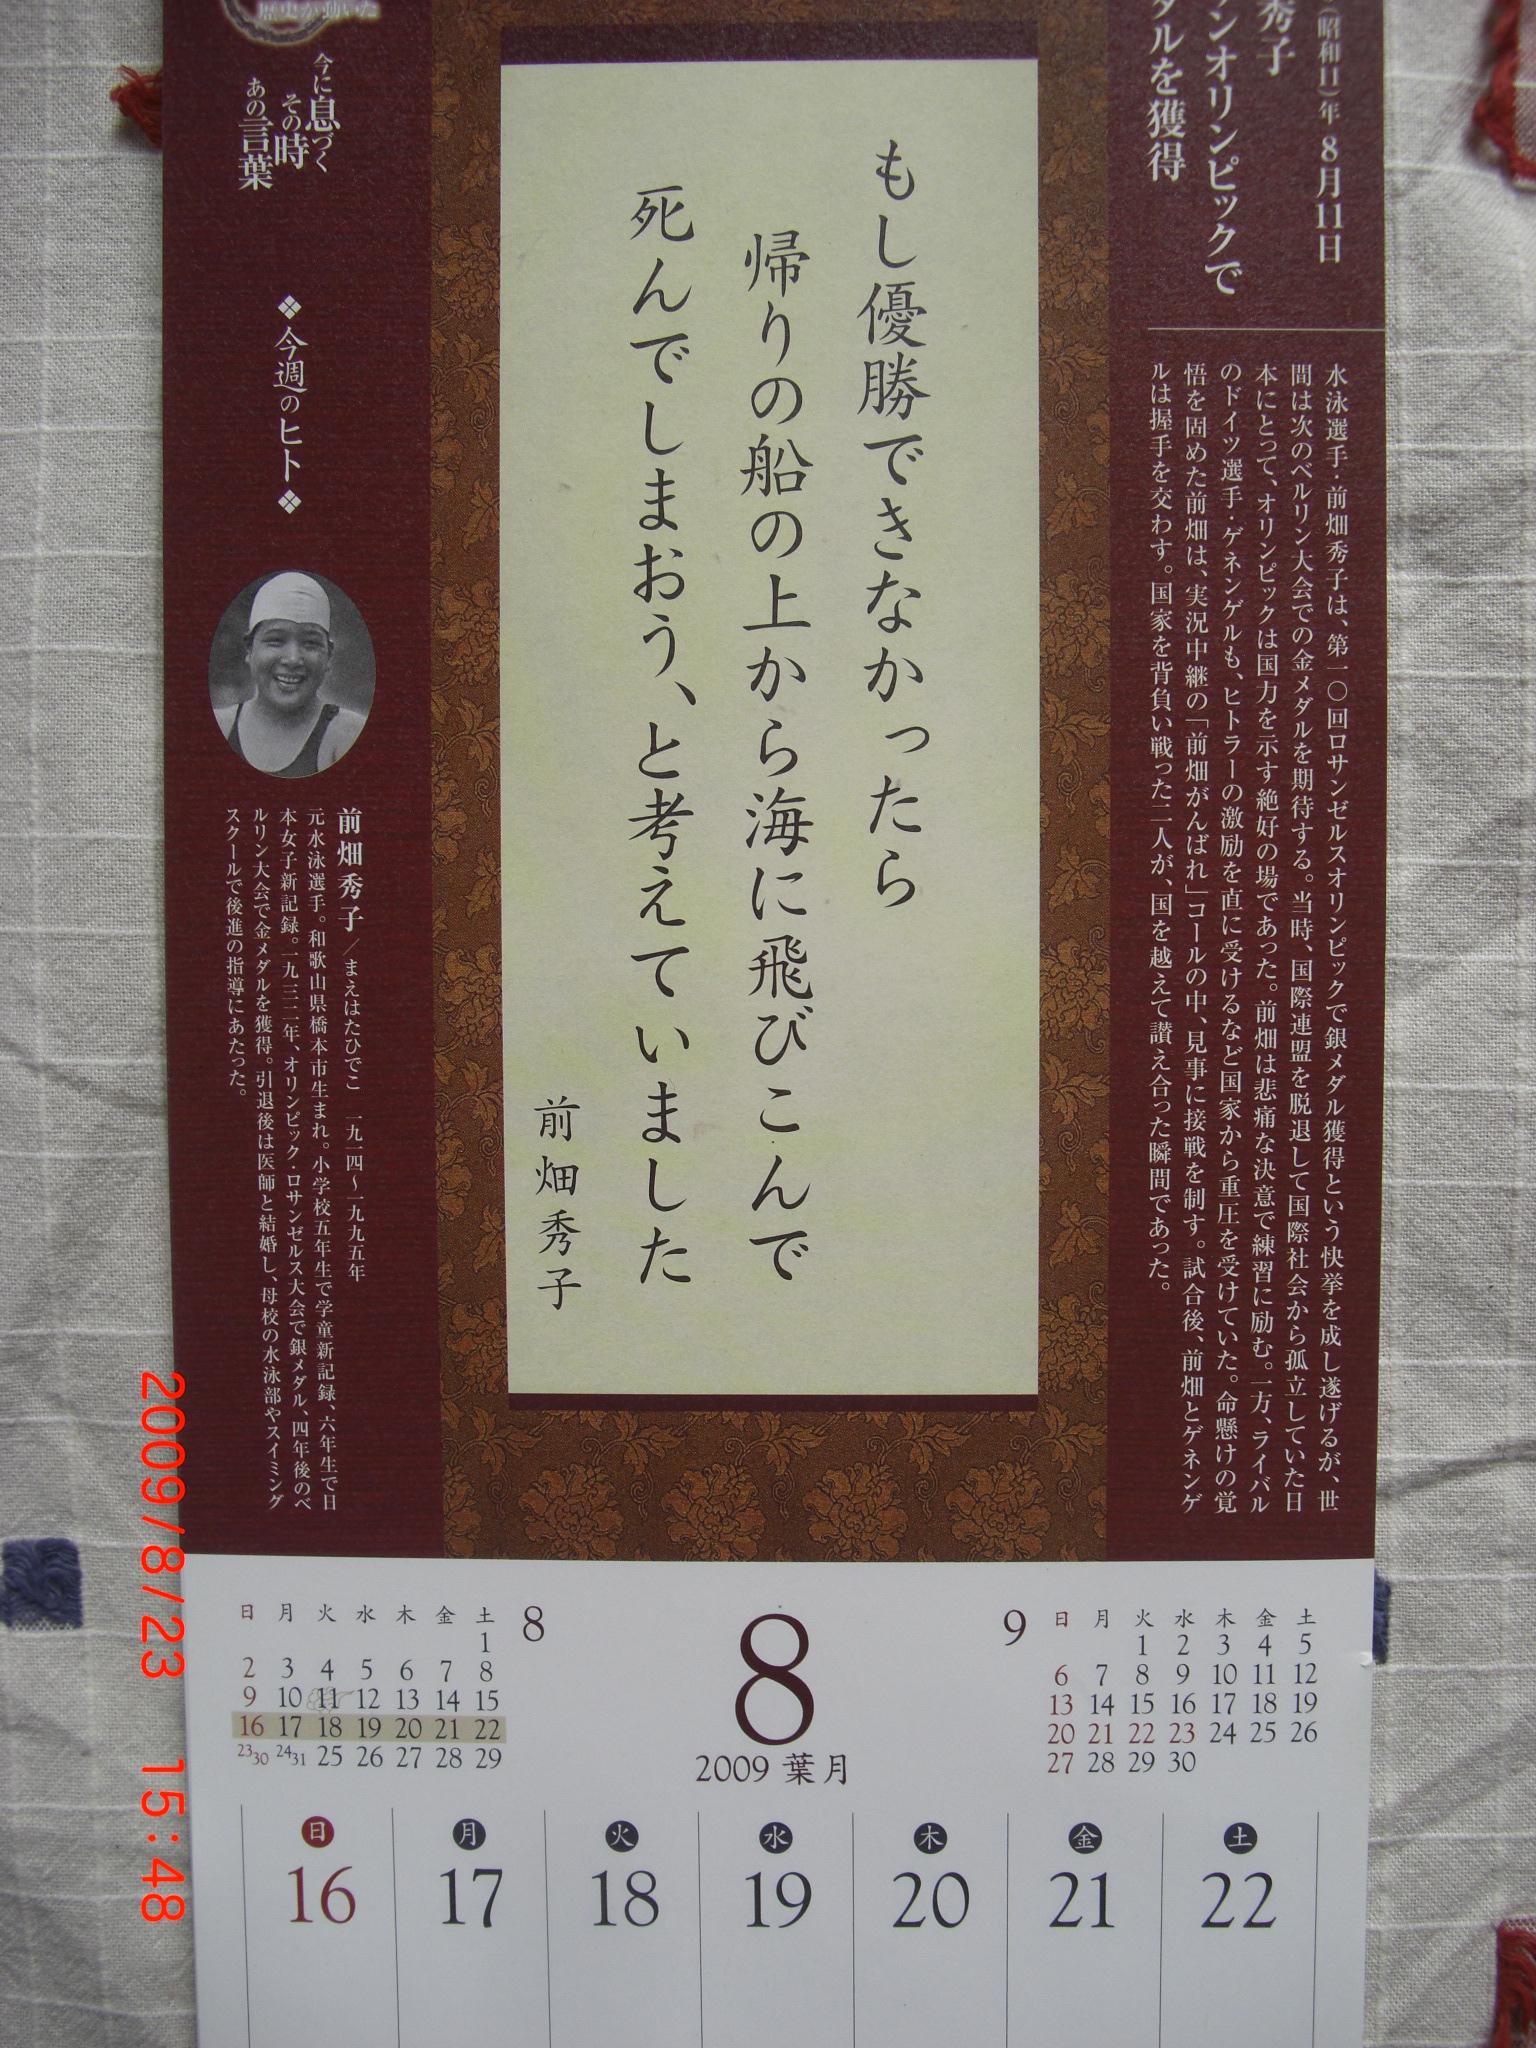 前畑秀子の画像 p1_18